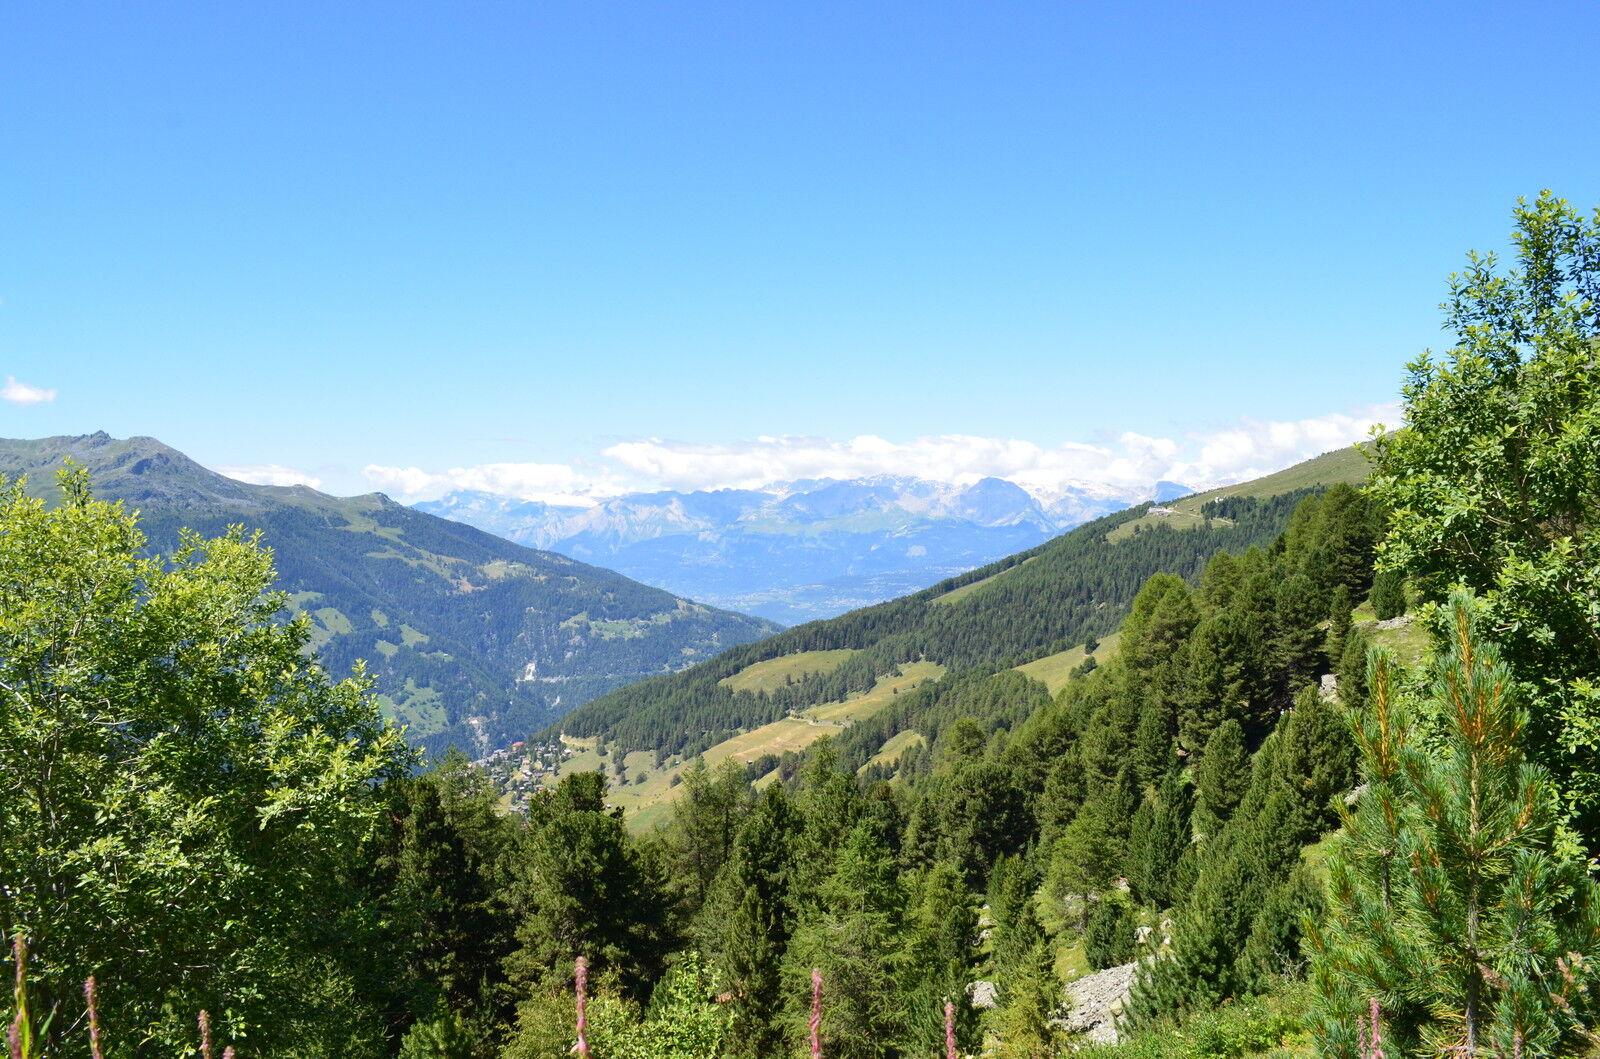 The Alpine Chalet